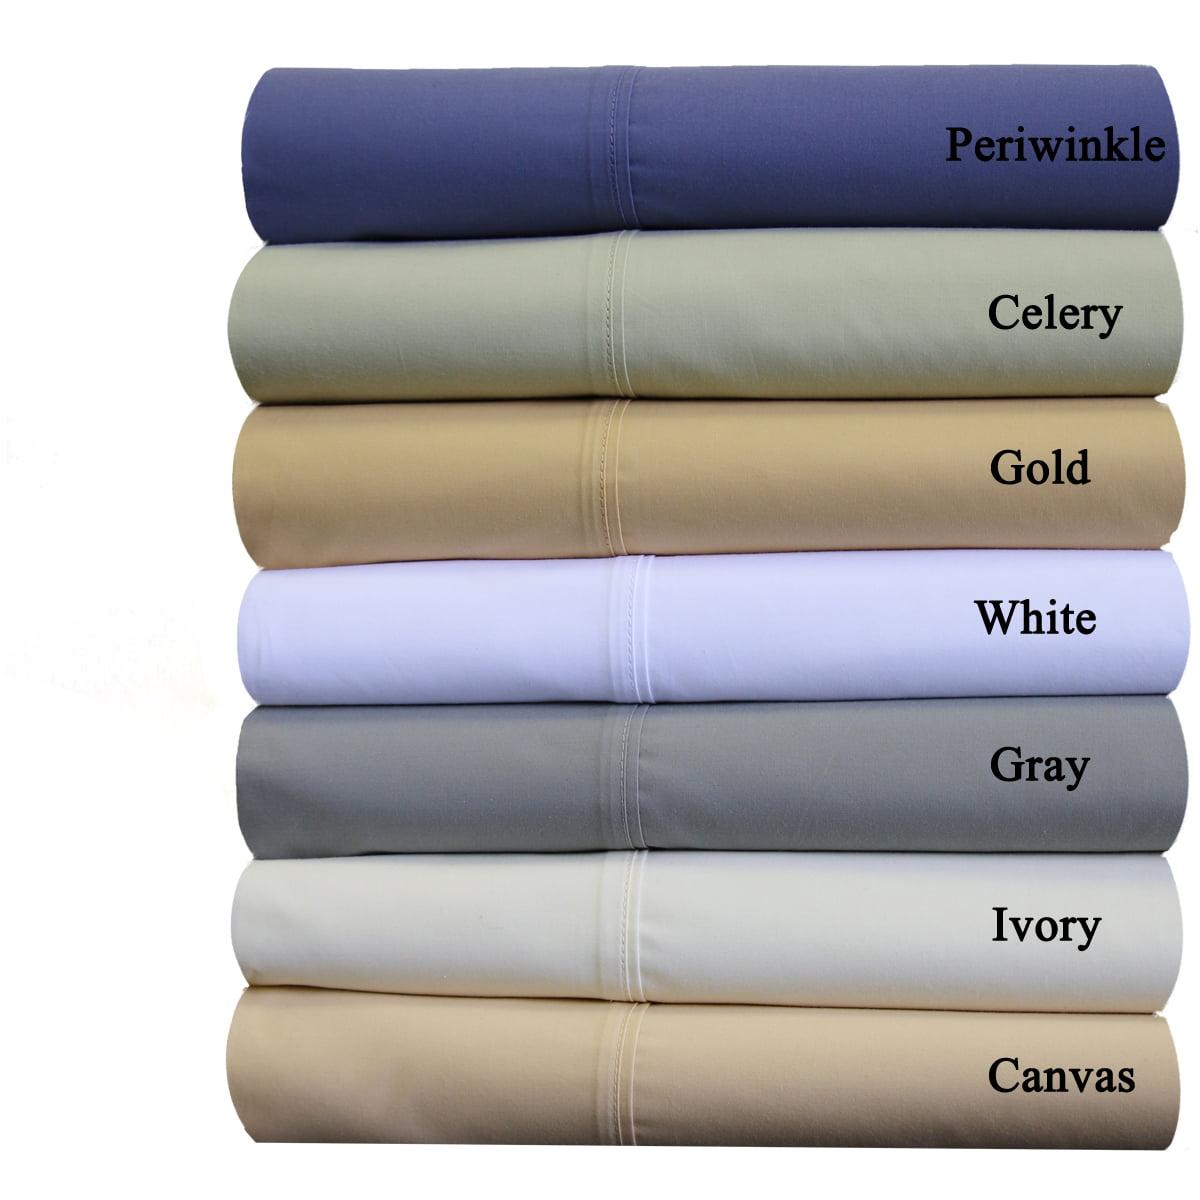 Split Adjustable California King Size Abripedic Percale, Breathable Crispy Soft Sheets